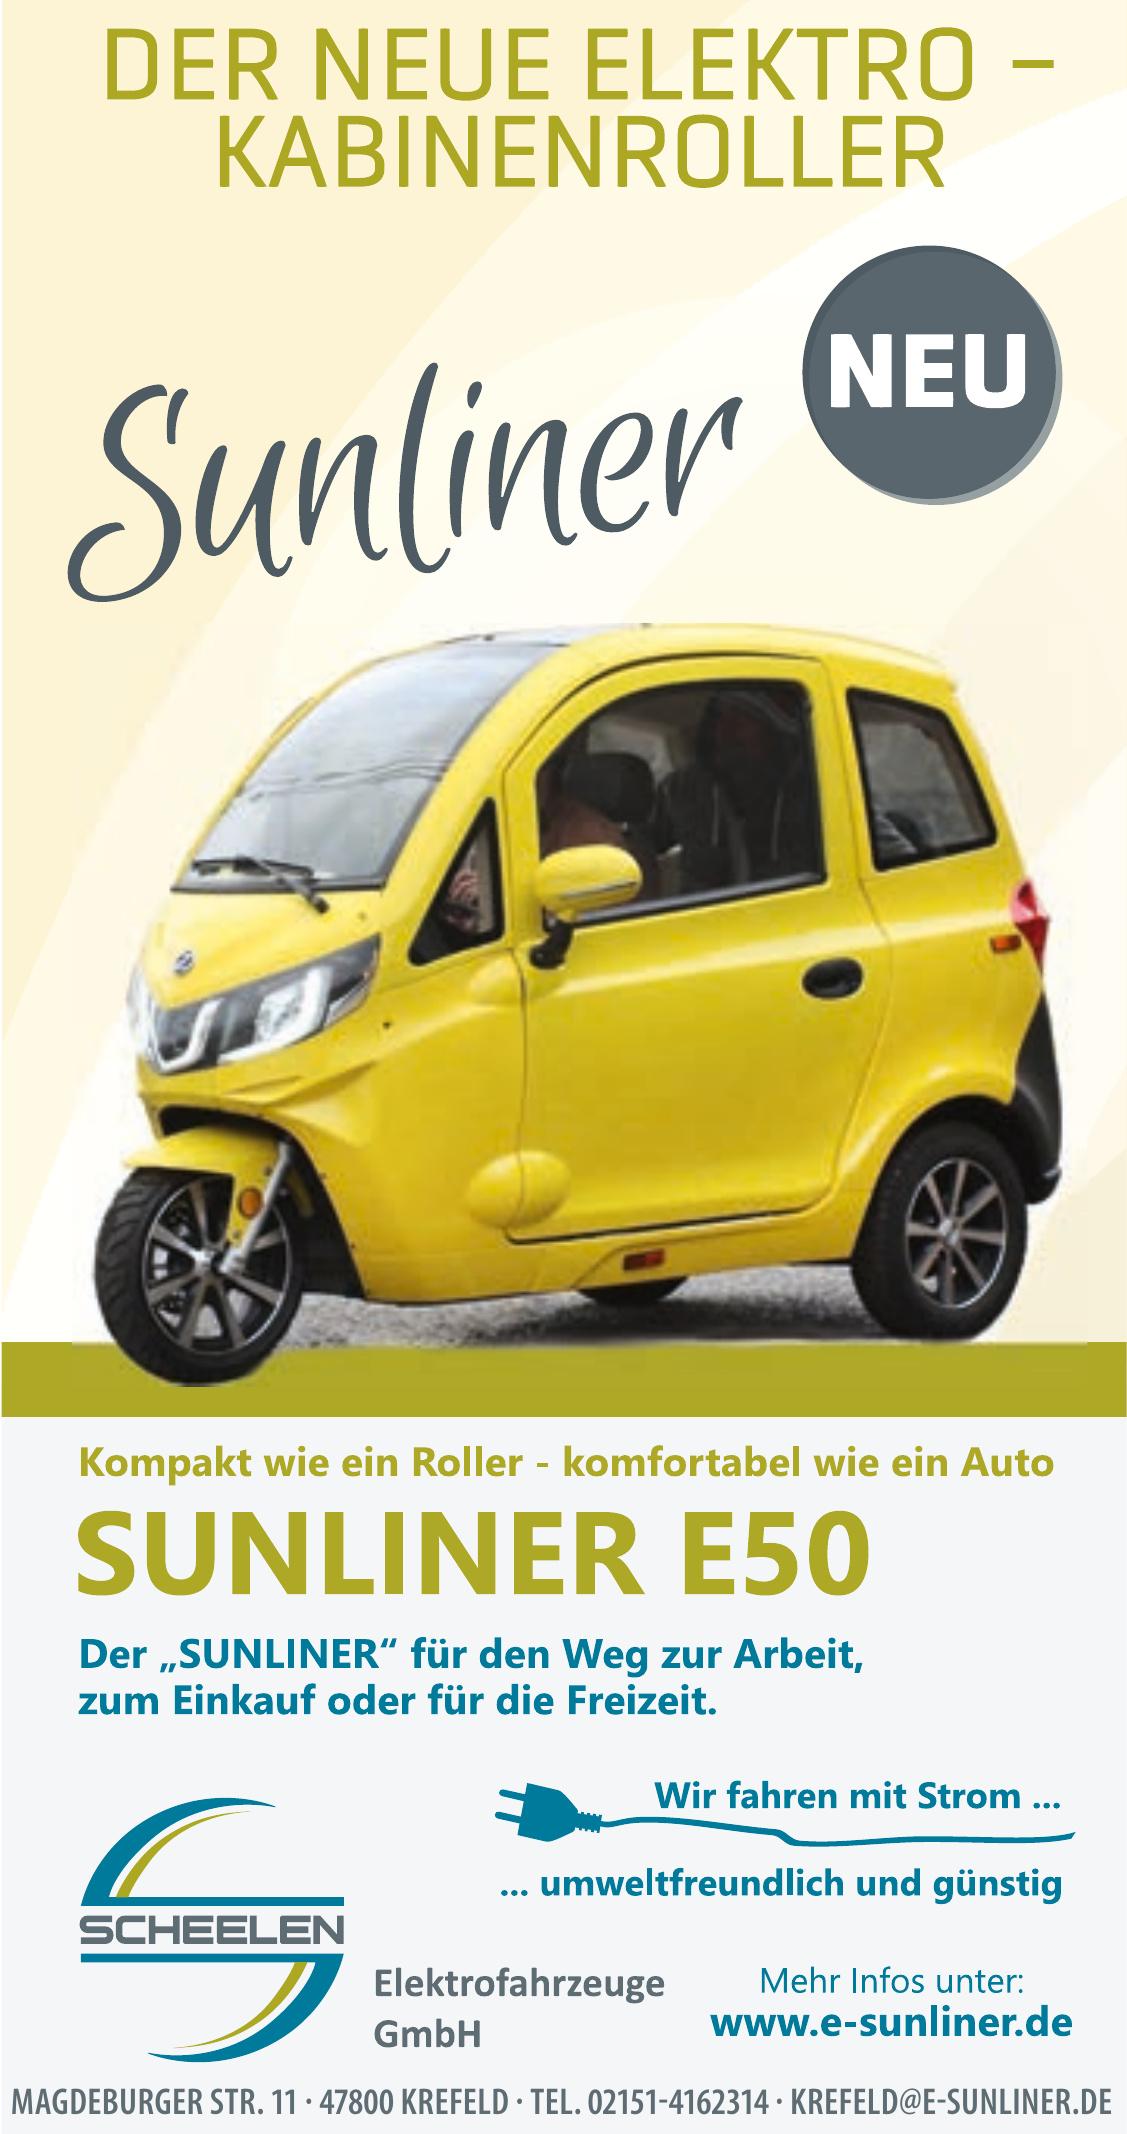 Scheelen Elektrofahrzeuge GmbH